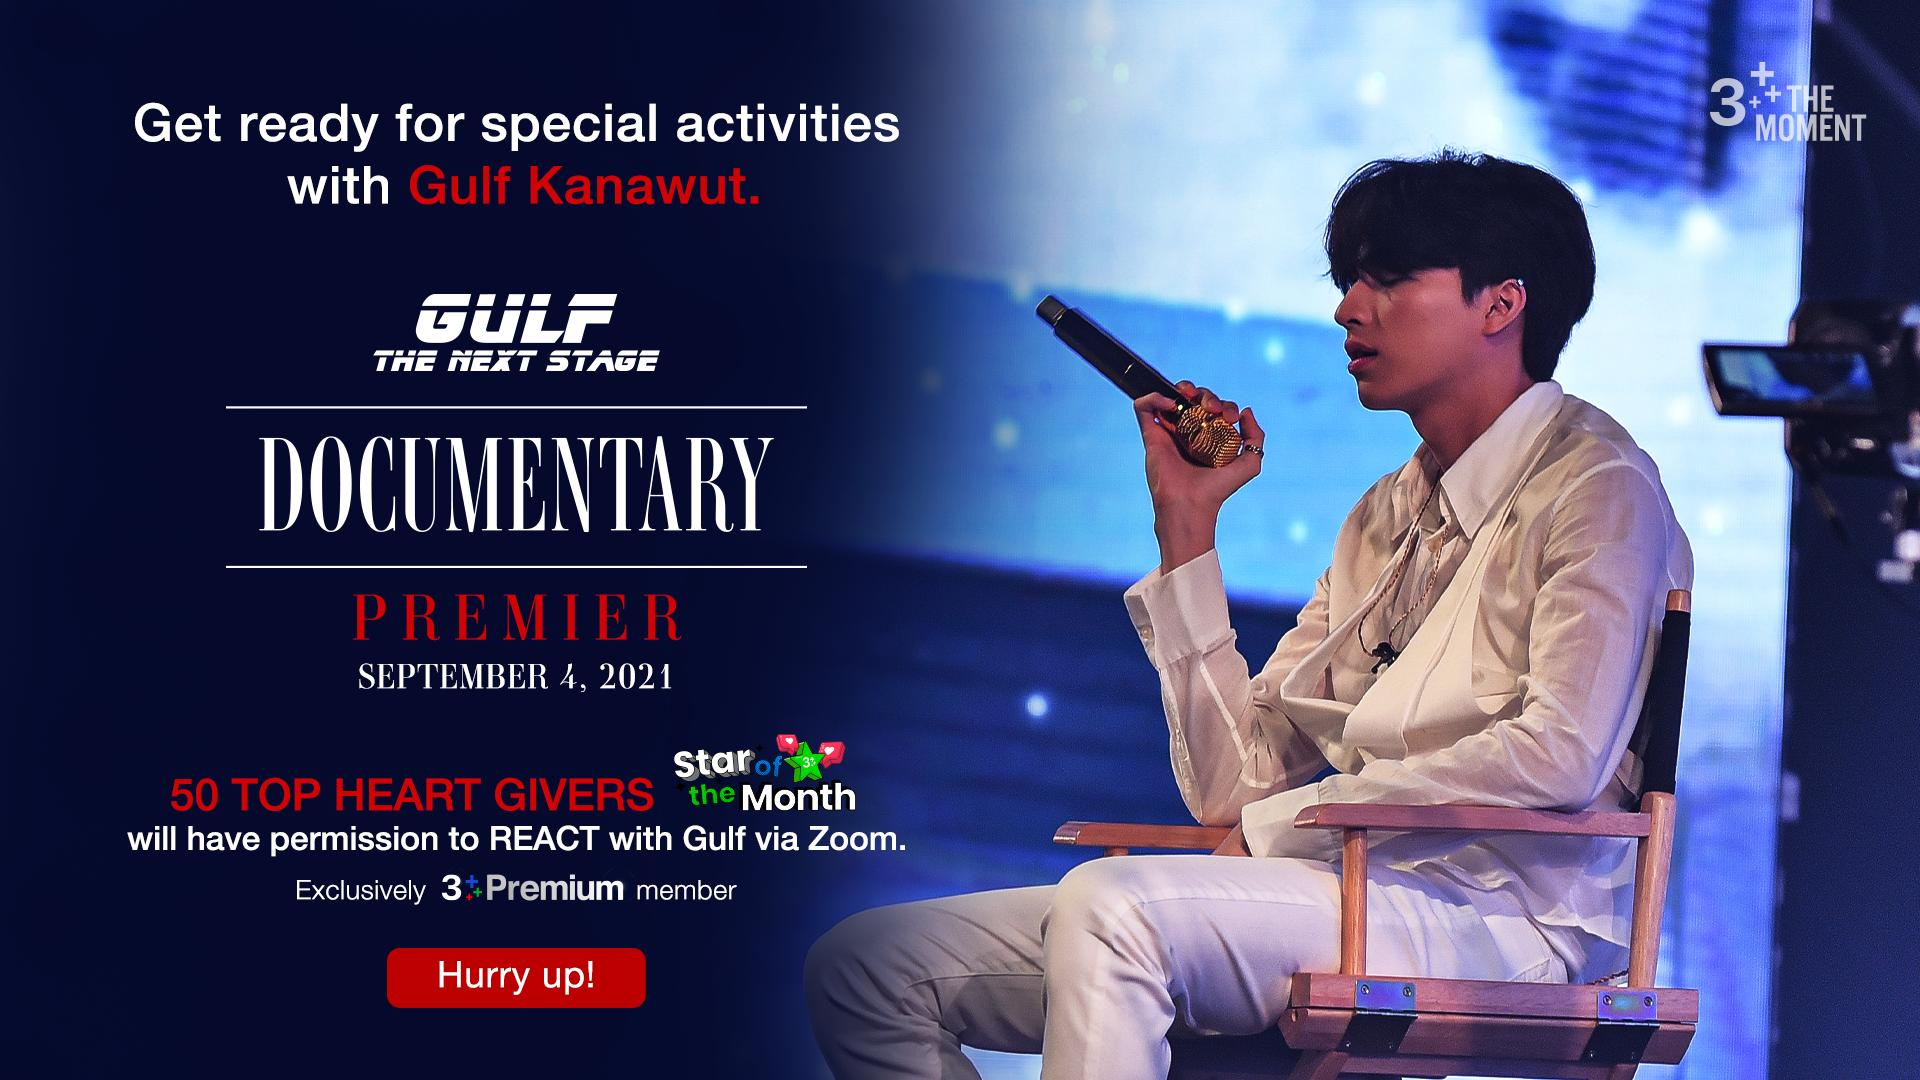 Gulf The Next Stage Documentary Premier ของขวัญสุดพิเศษสำหรับแฟนด้อม Star of the Month  ที่โหวตให้กลัฟเป็นอันดับ 1 มาอย่างต่อเนื่อง!